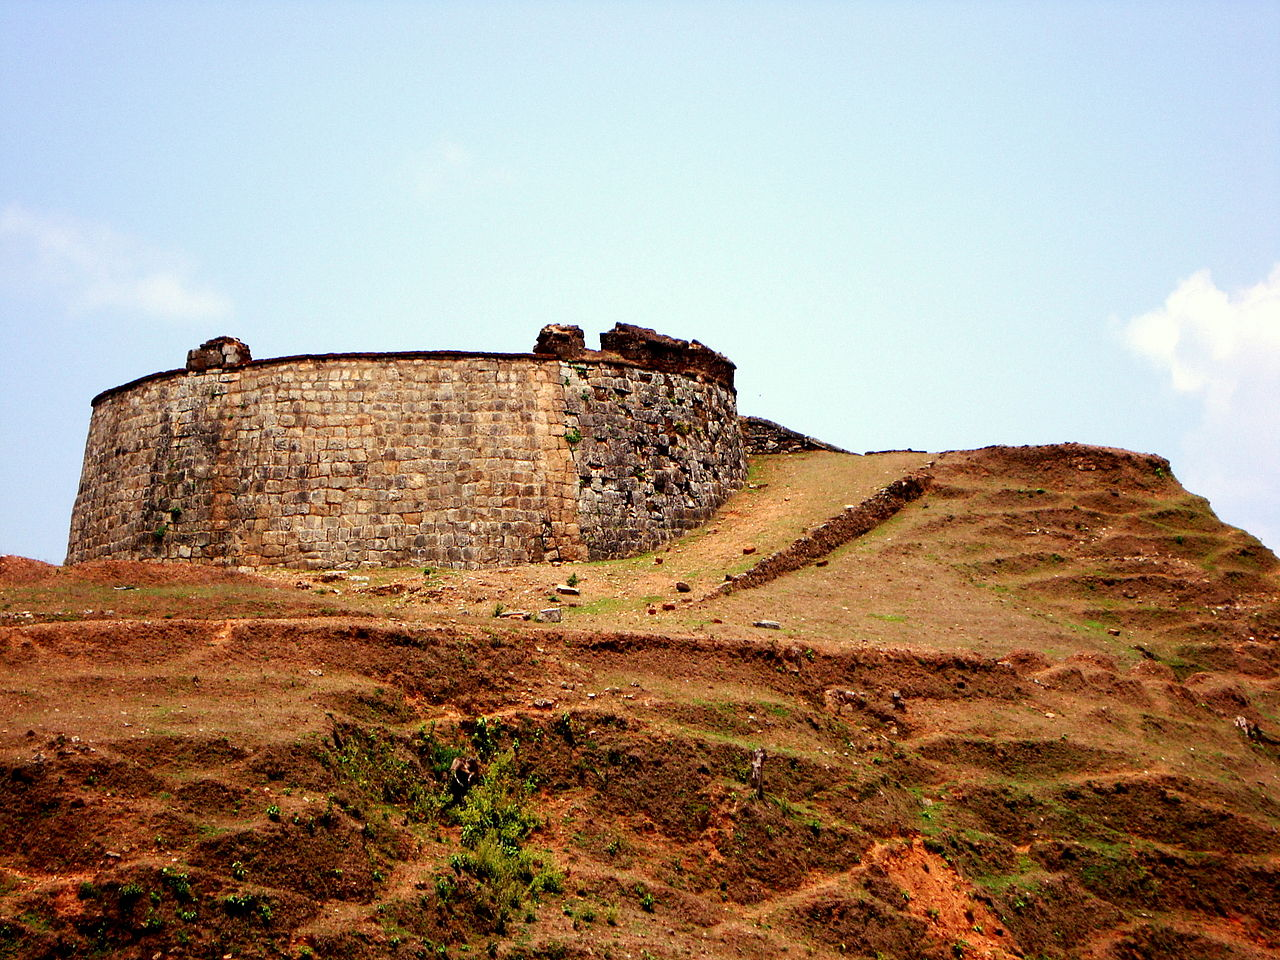 Why Should you visit the Nagara Fort in Kodachadri?